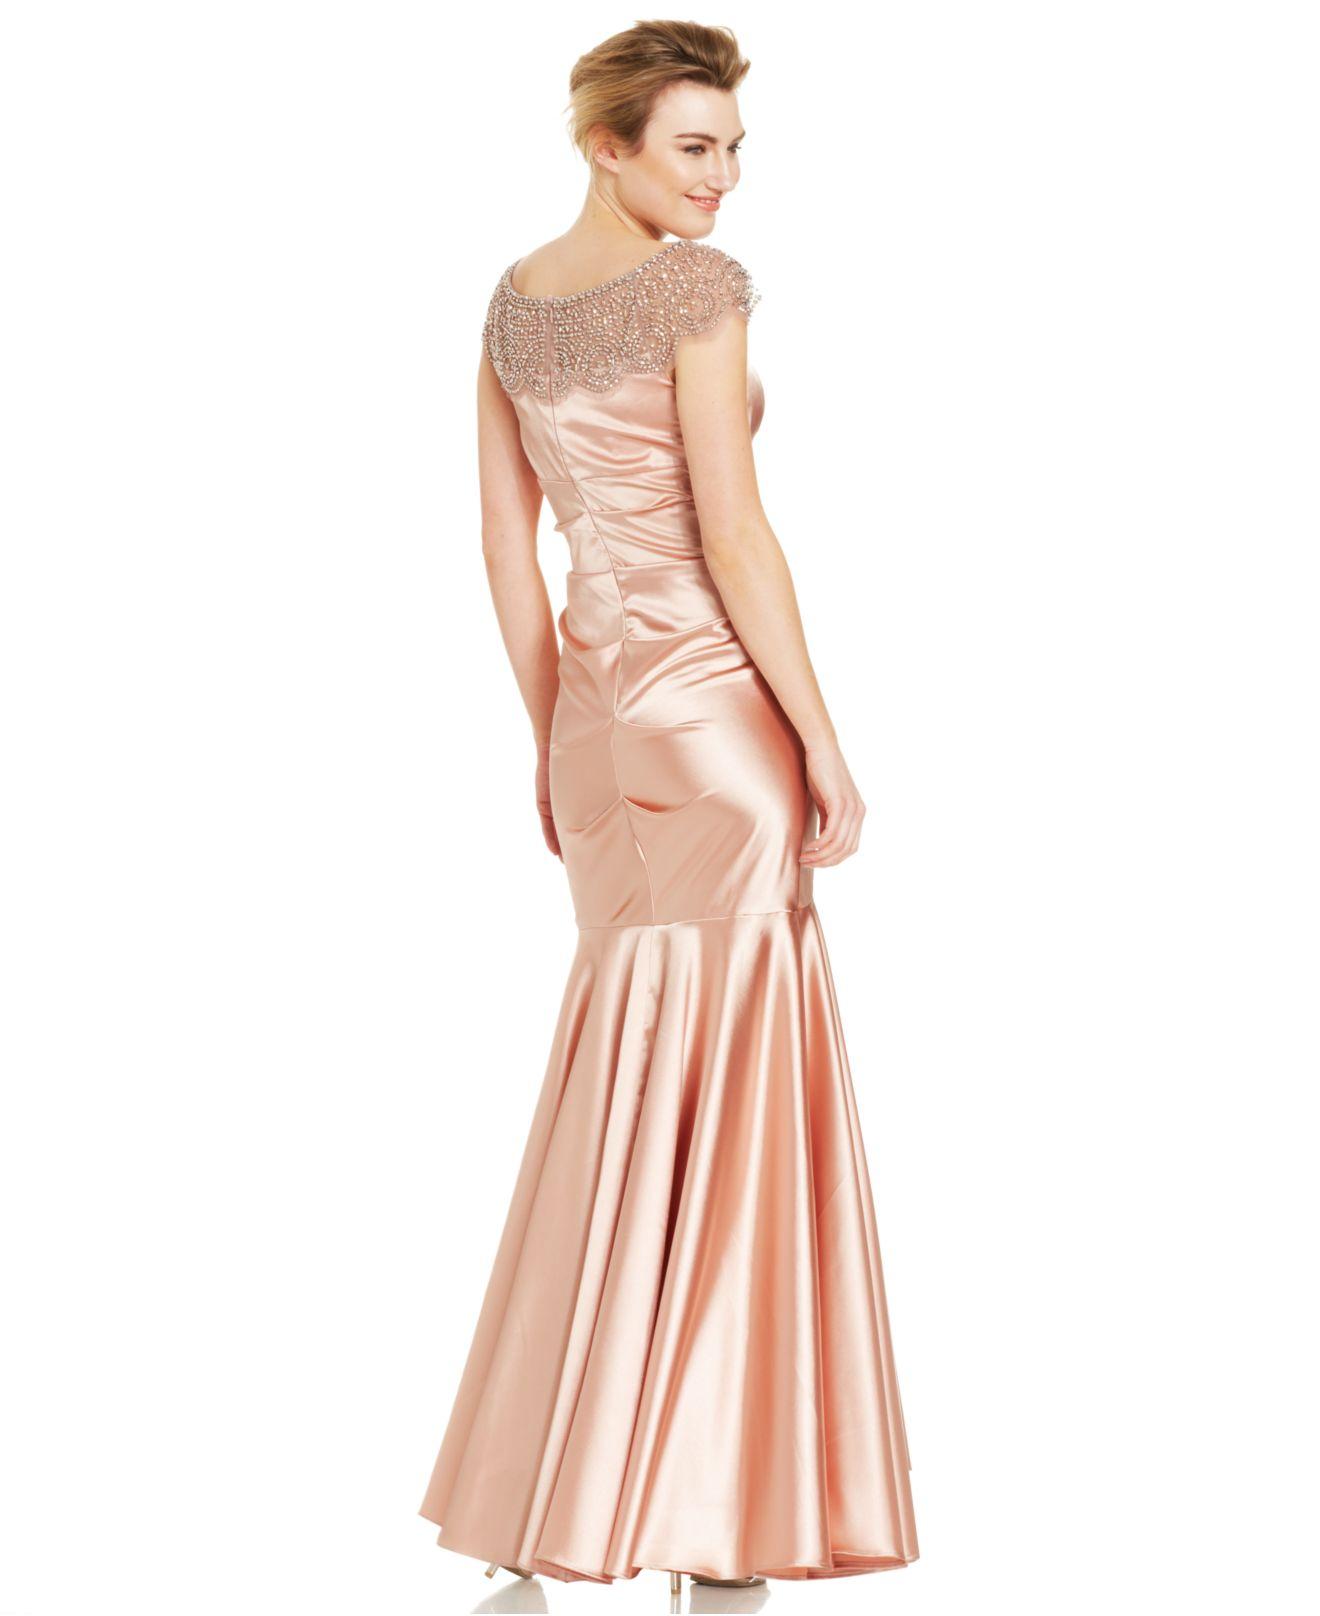 Xscape Dresses Mermaid – Fashion dresses